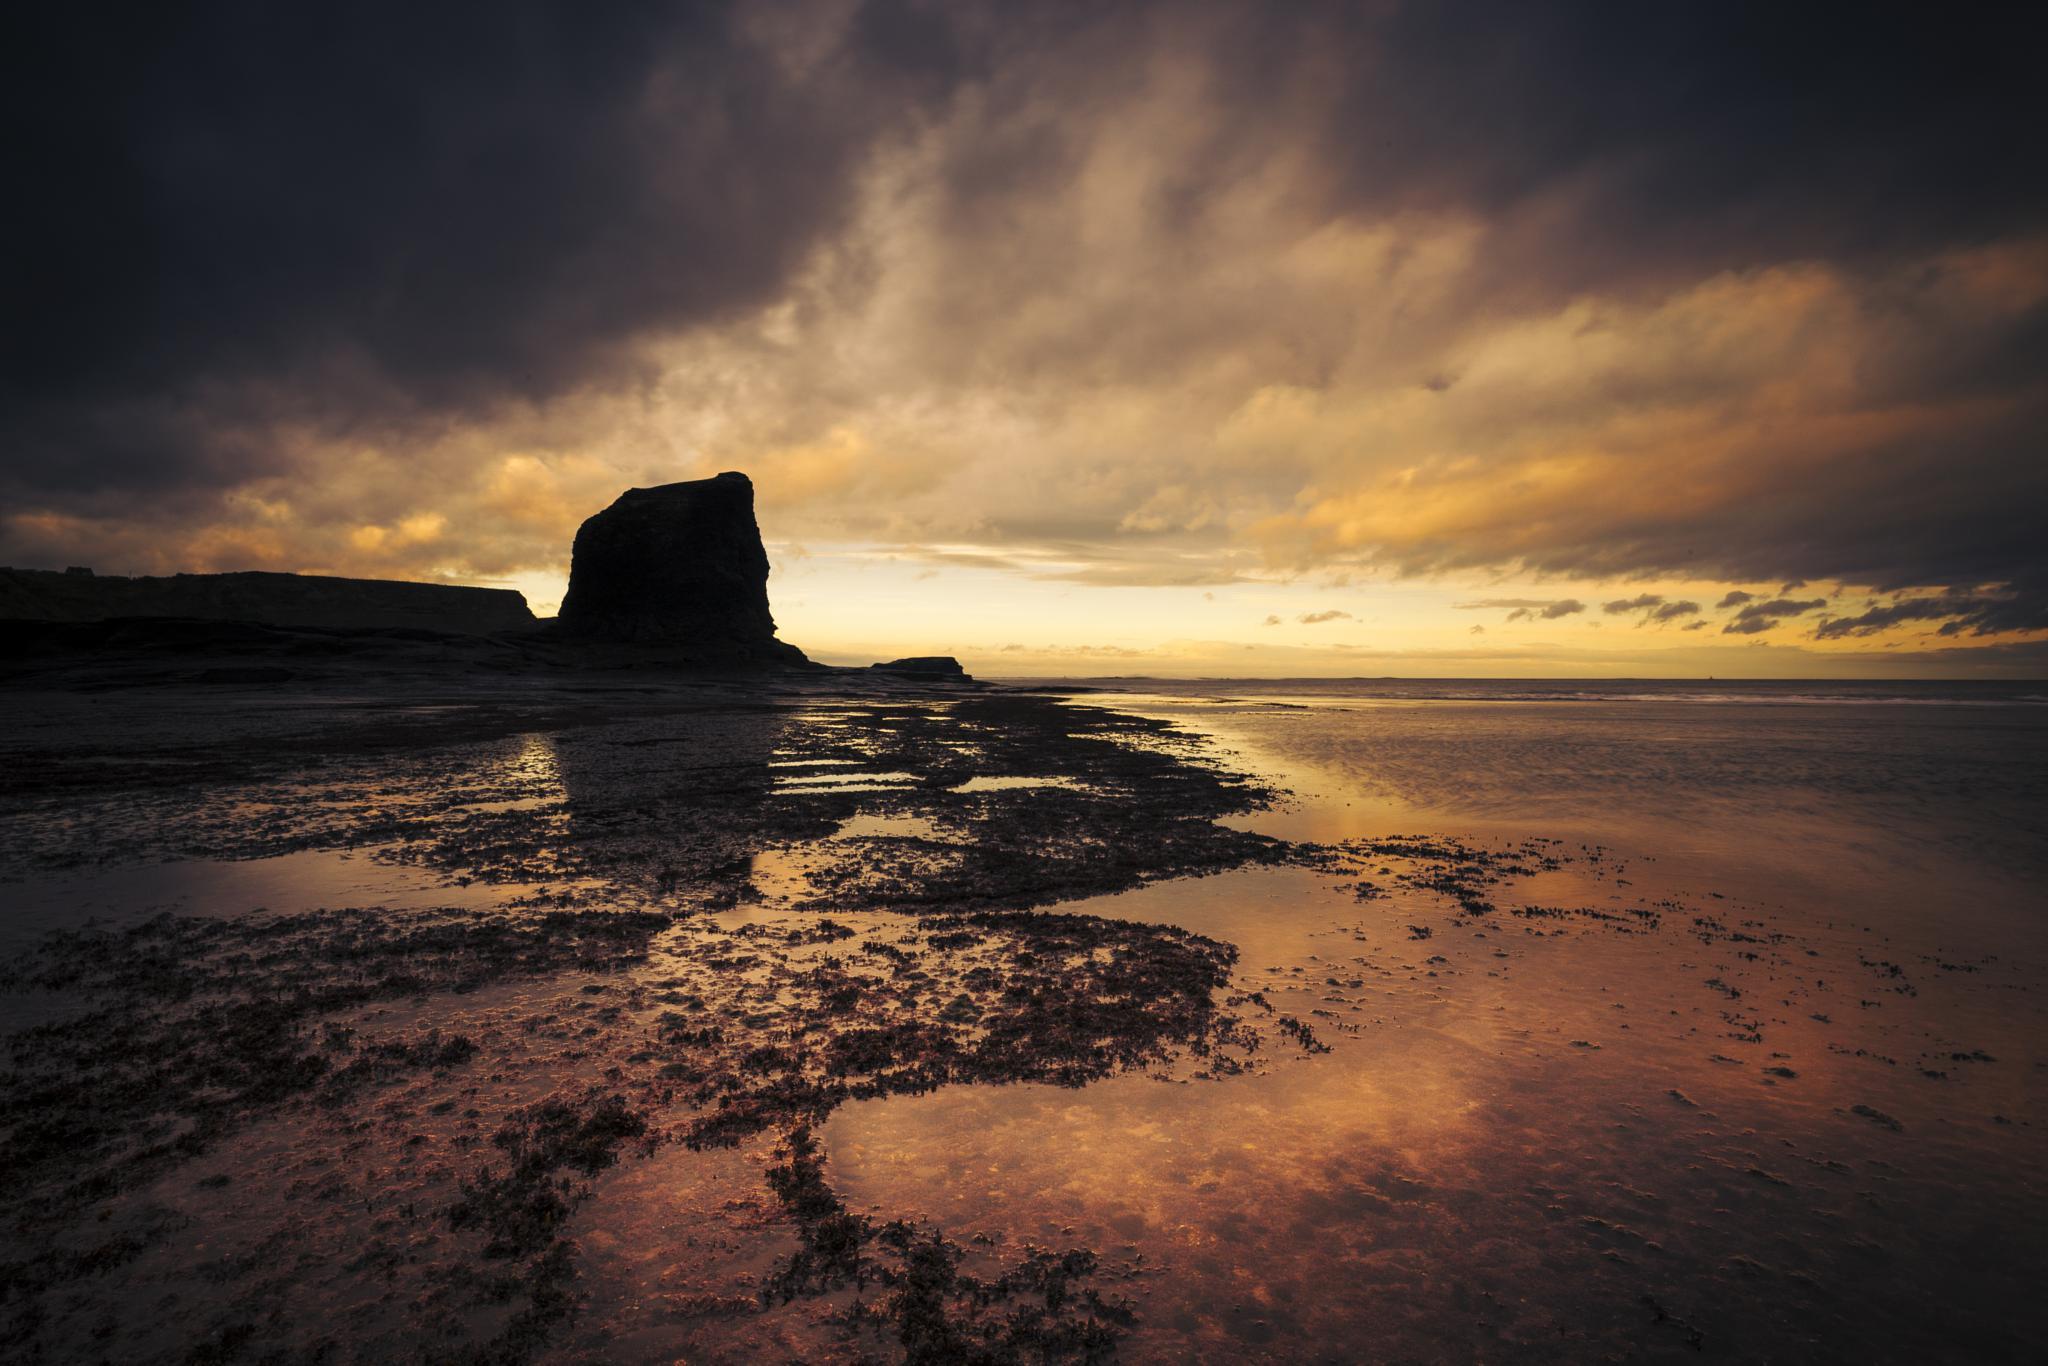 Sunset and Black Nab by Tony Shaw